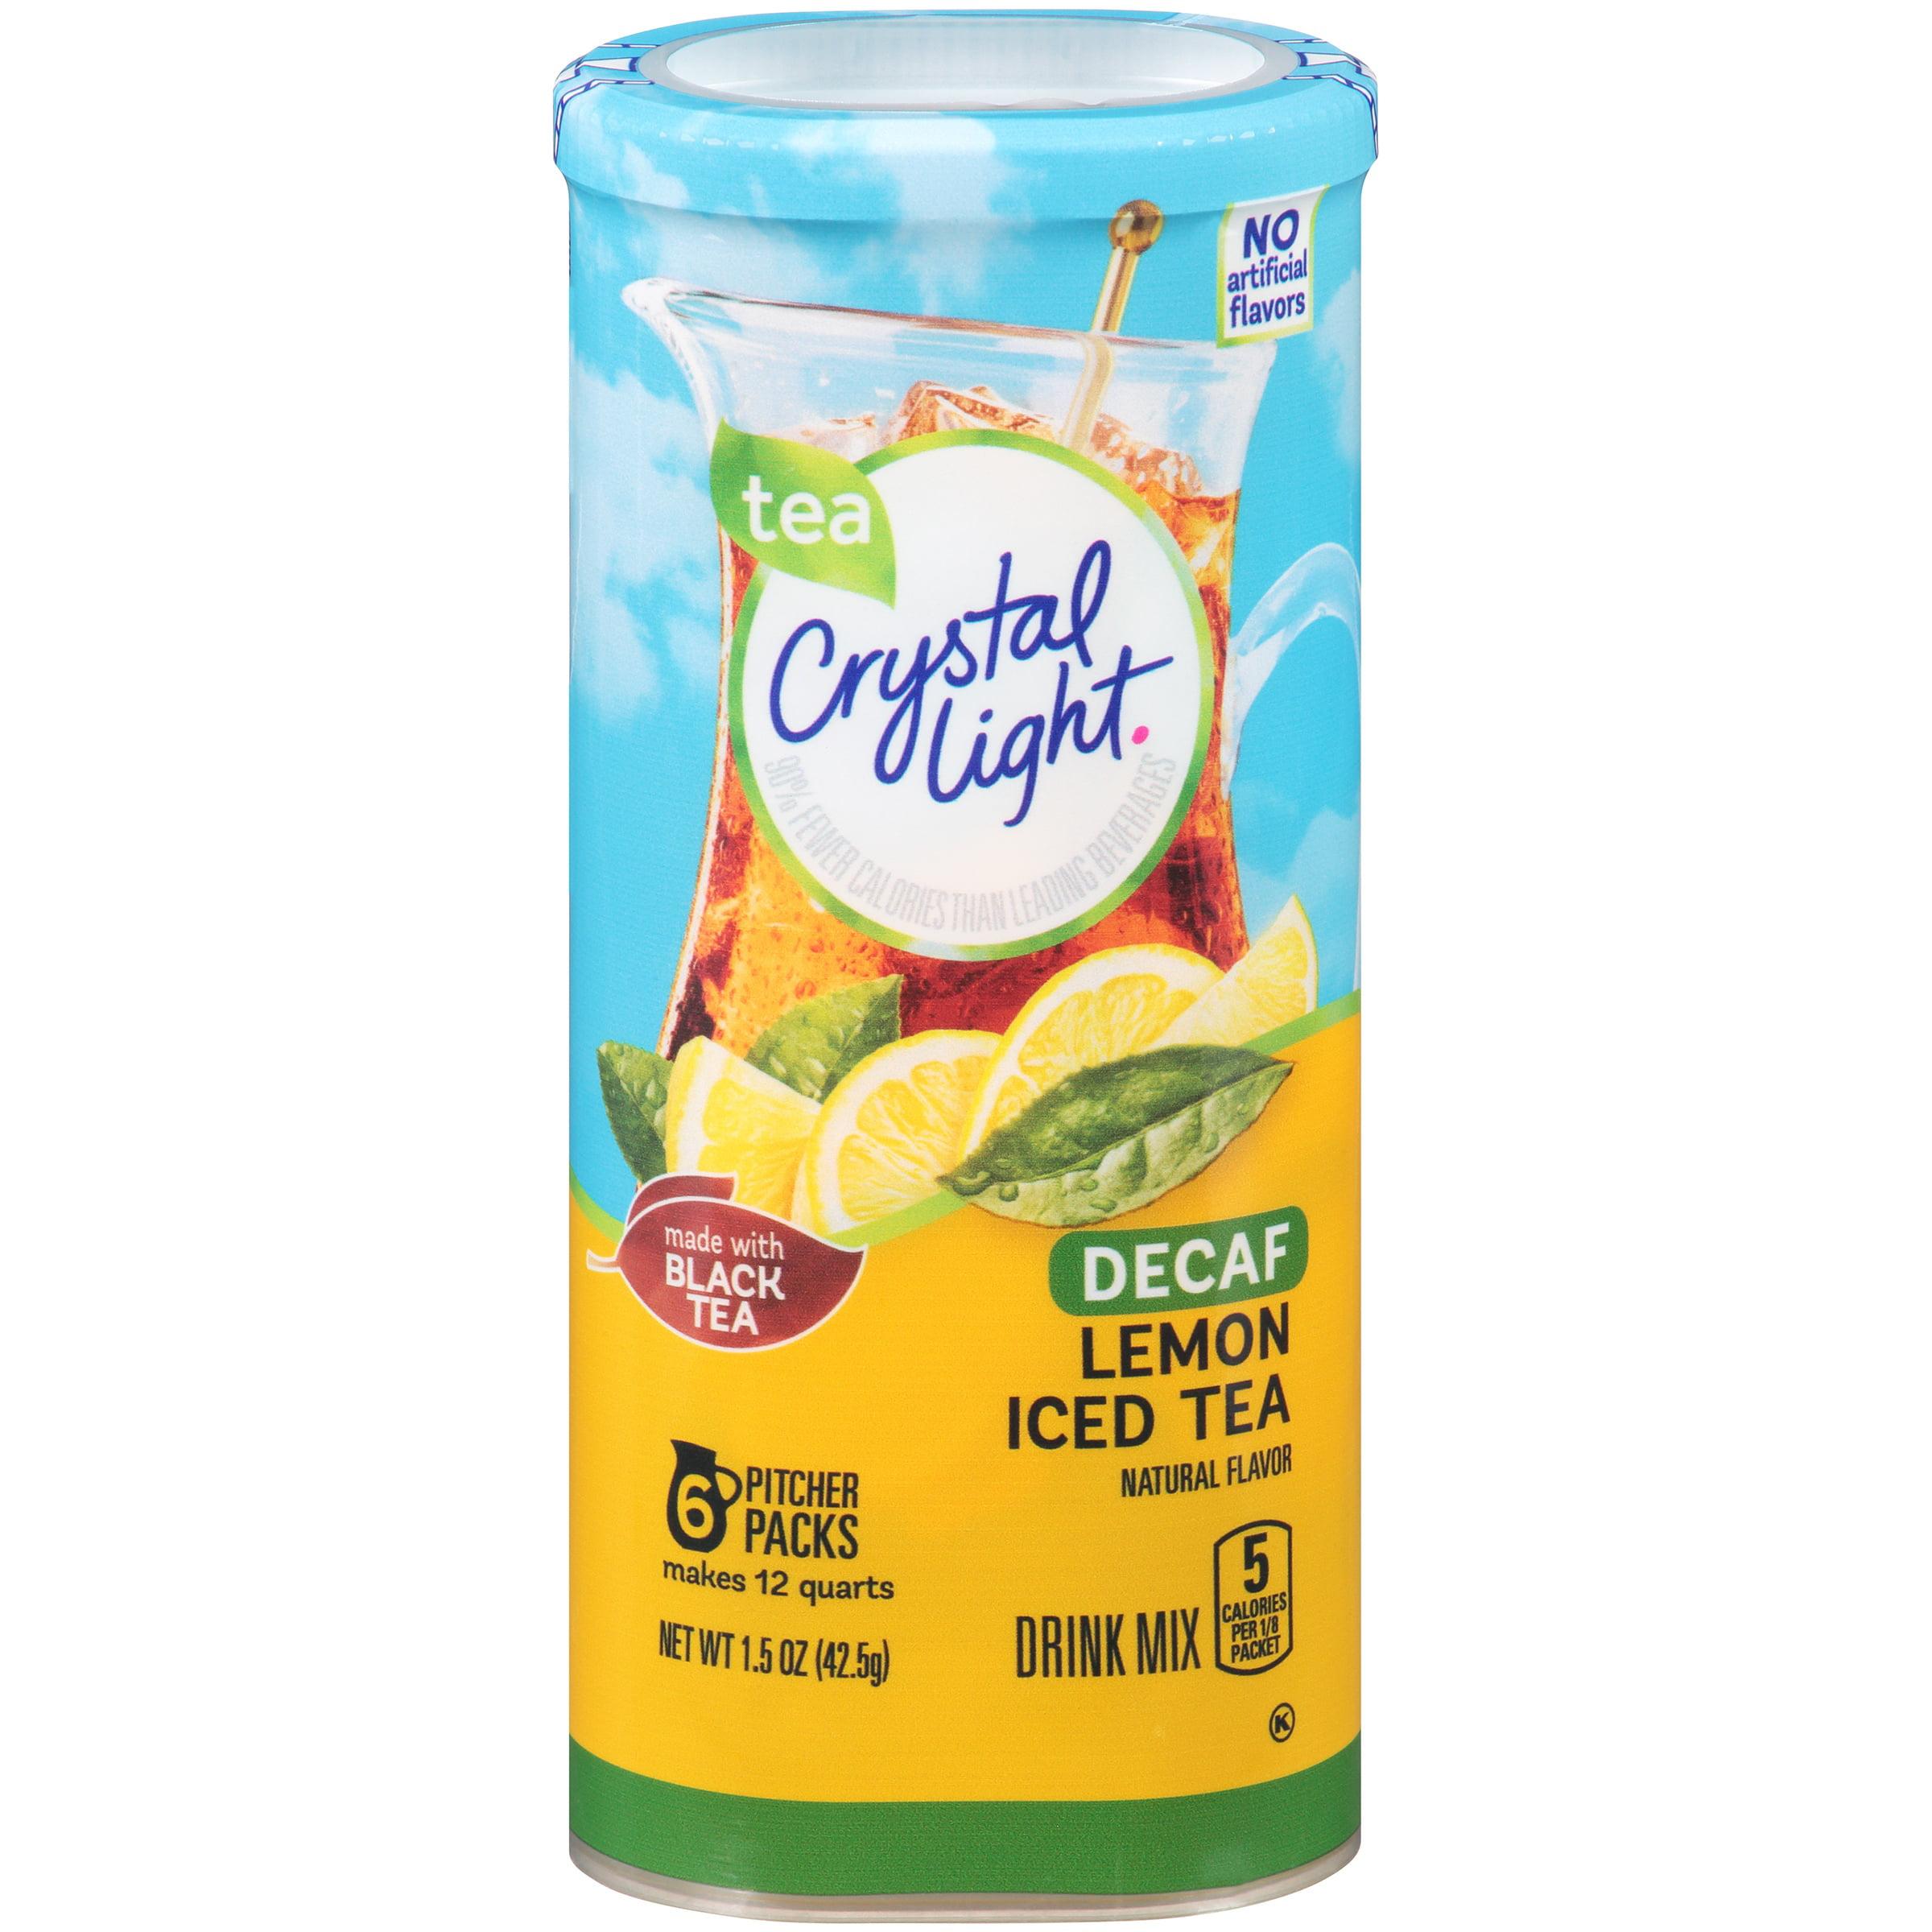 Crystal Light Decaf Lemon Iced Tea Drink Mix 6 ct Canister